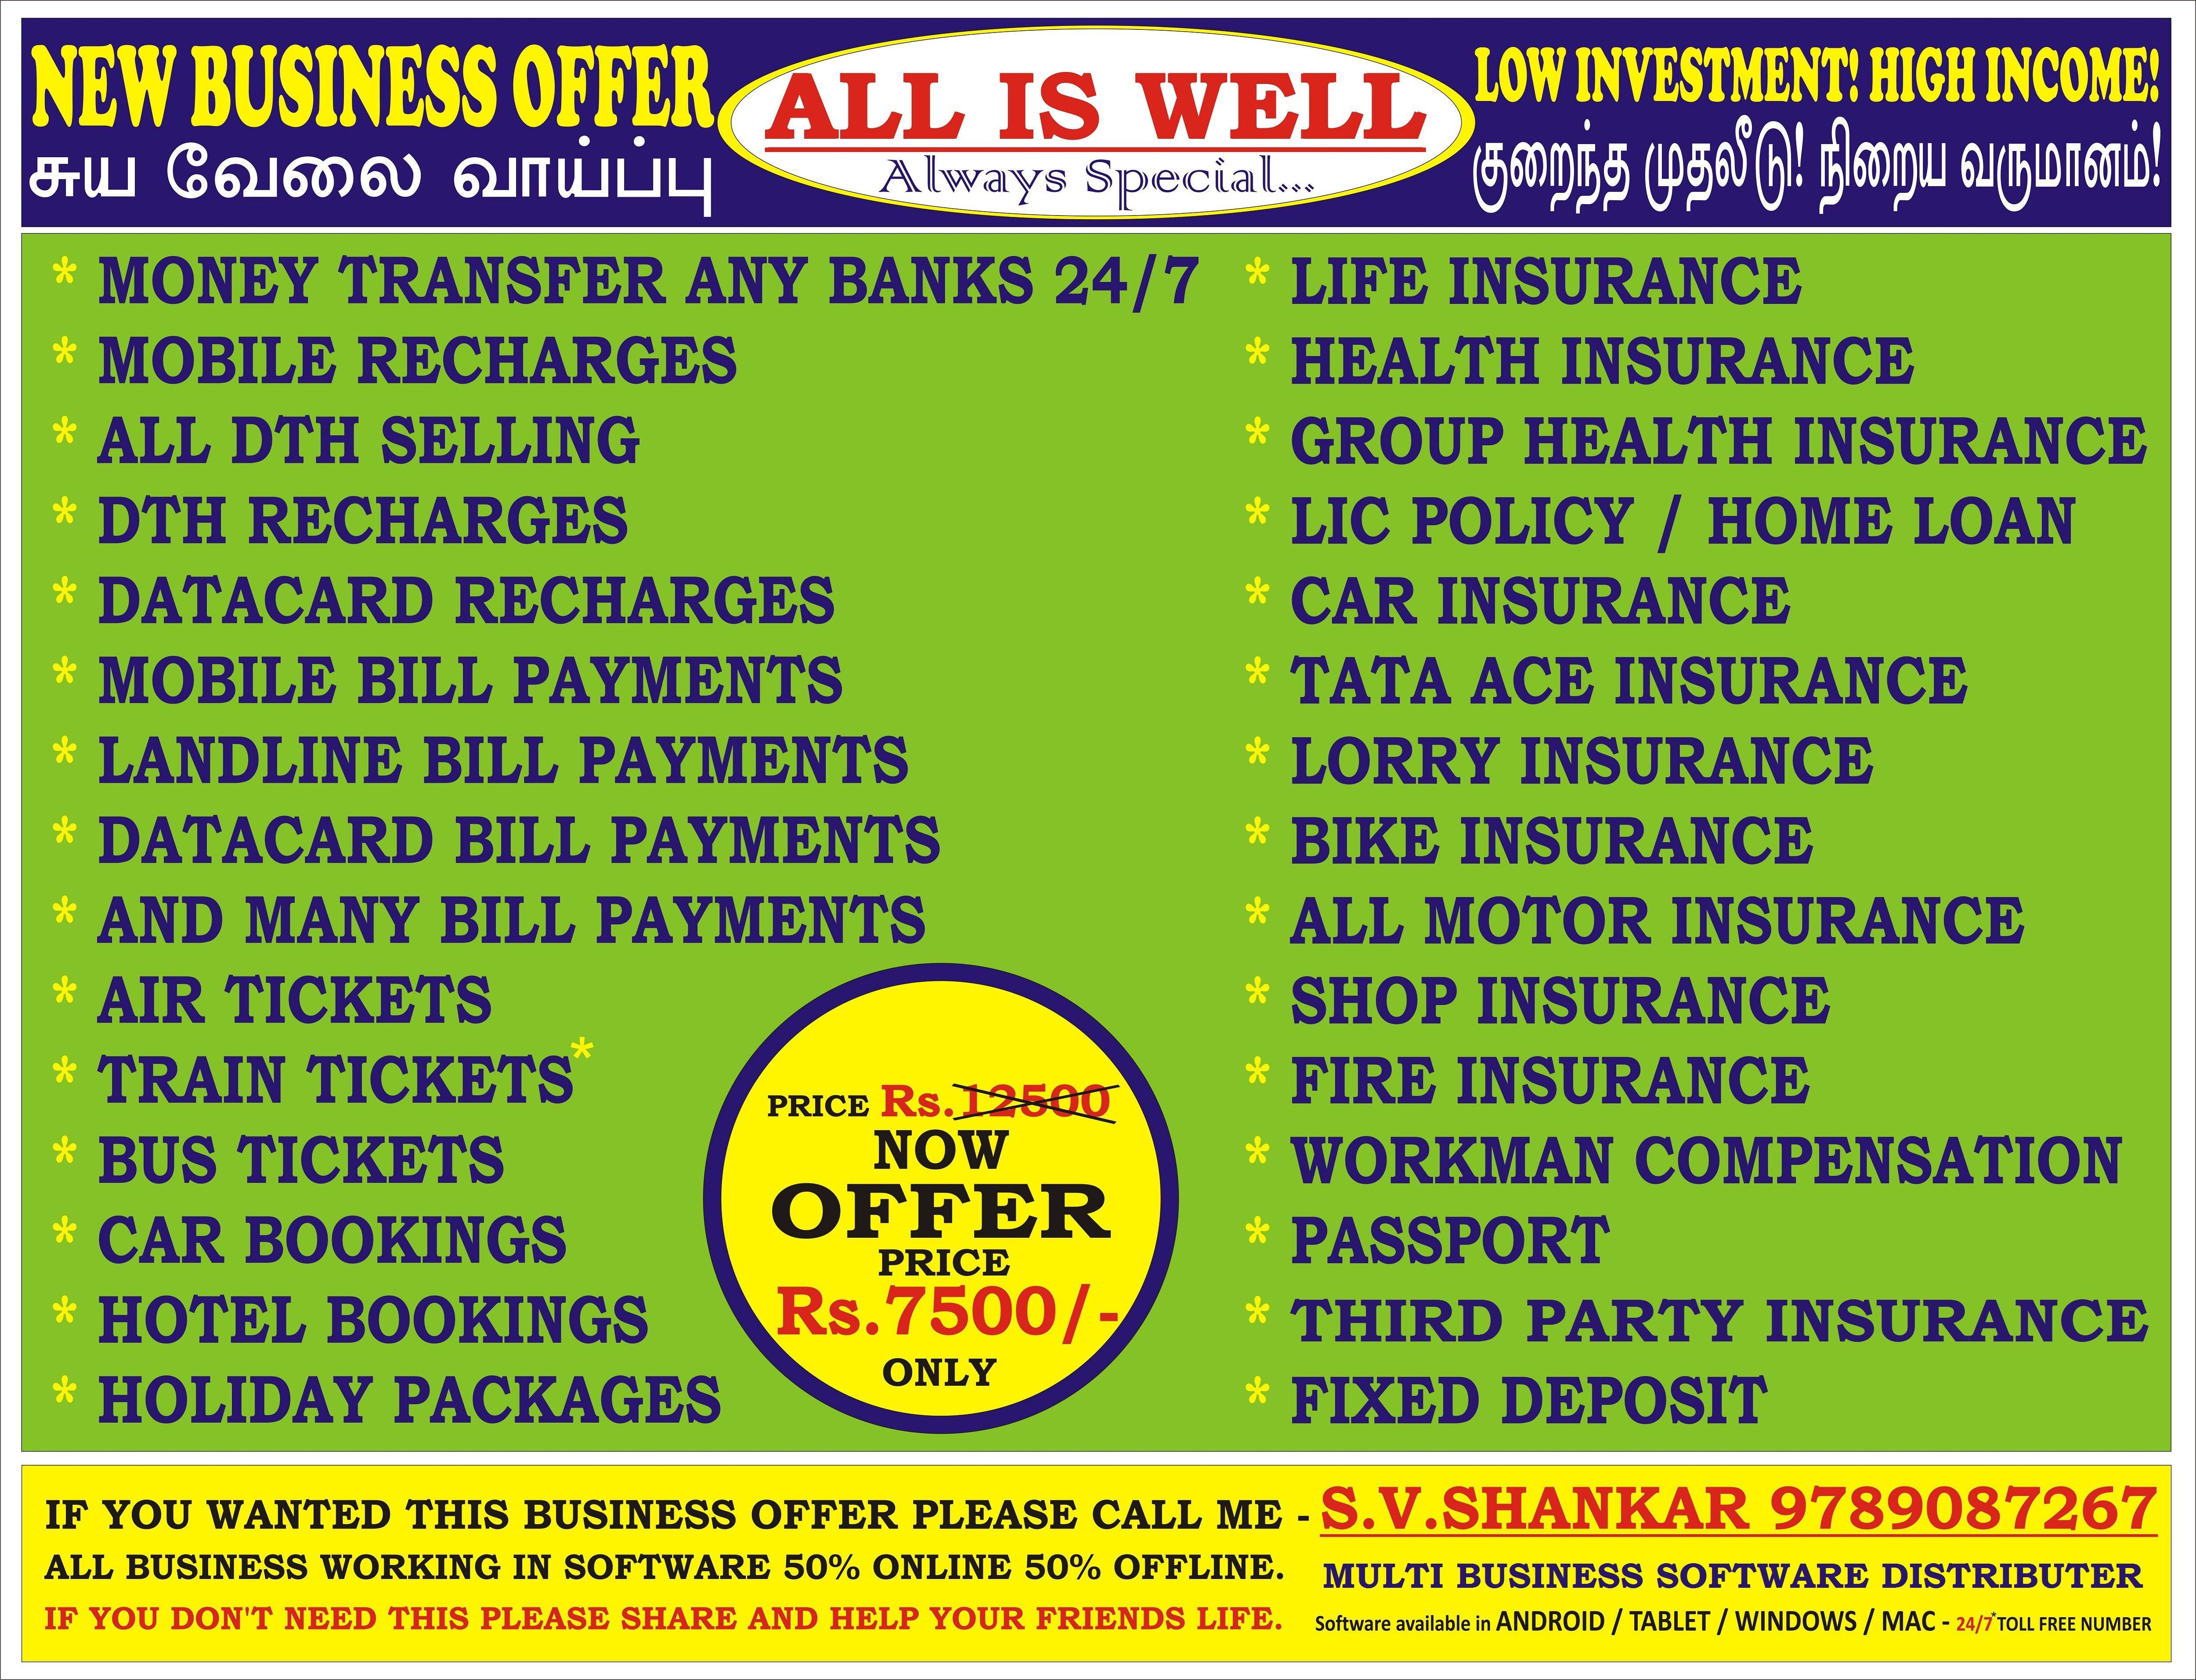 NEW BUSINESS OFFER THAI PIRANTHAL VAZHI PIRAKKHUM... START